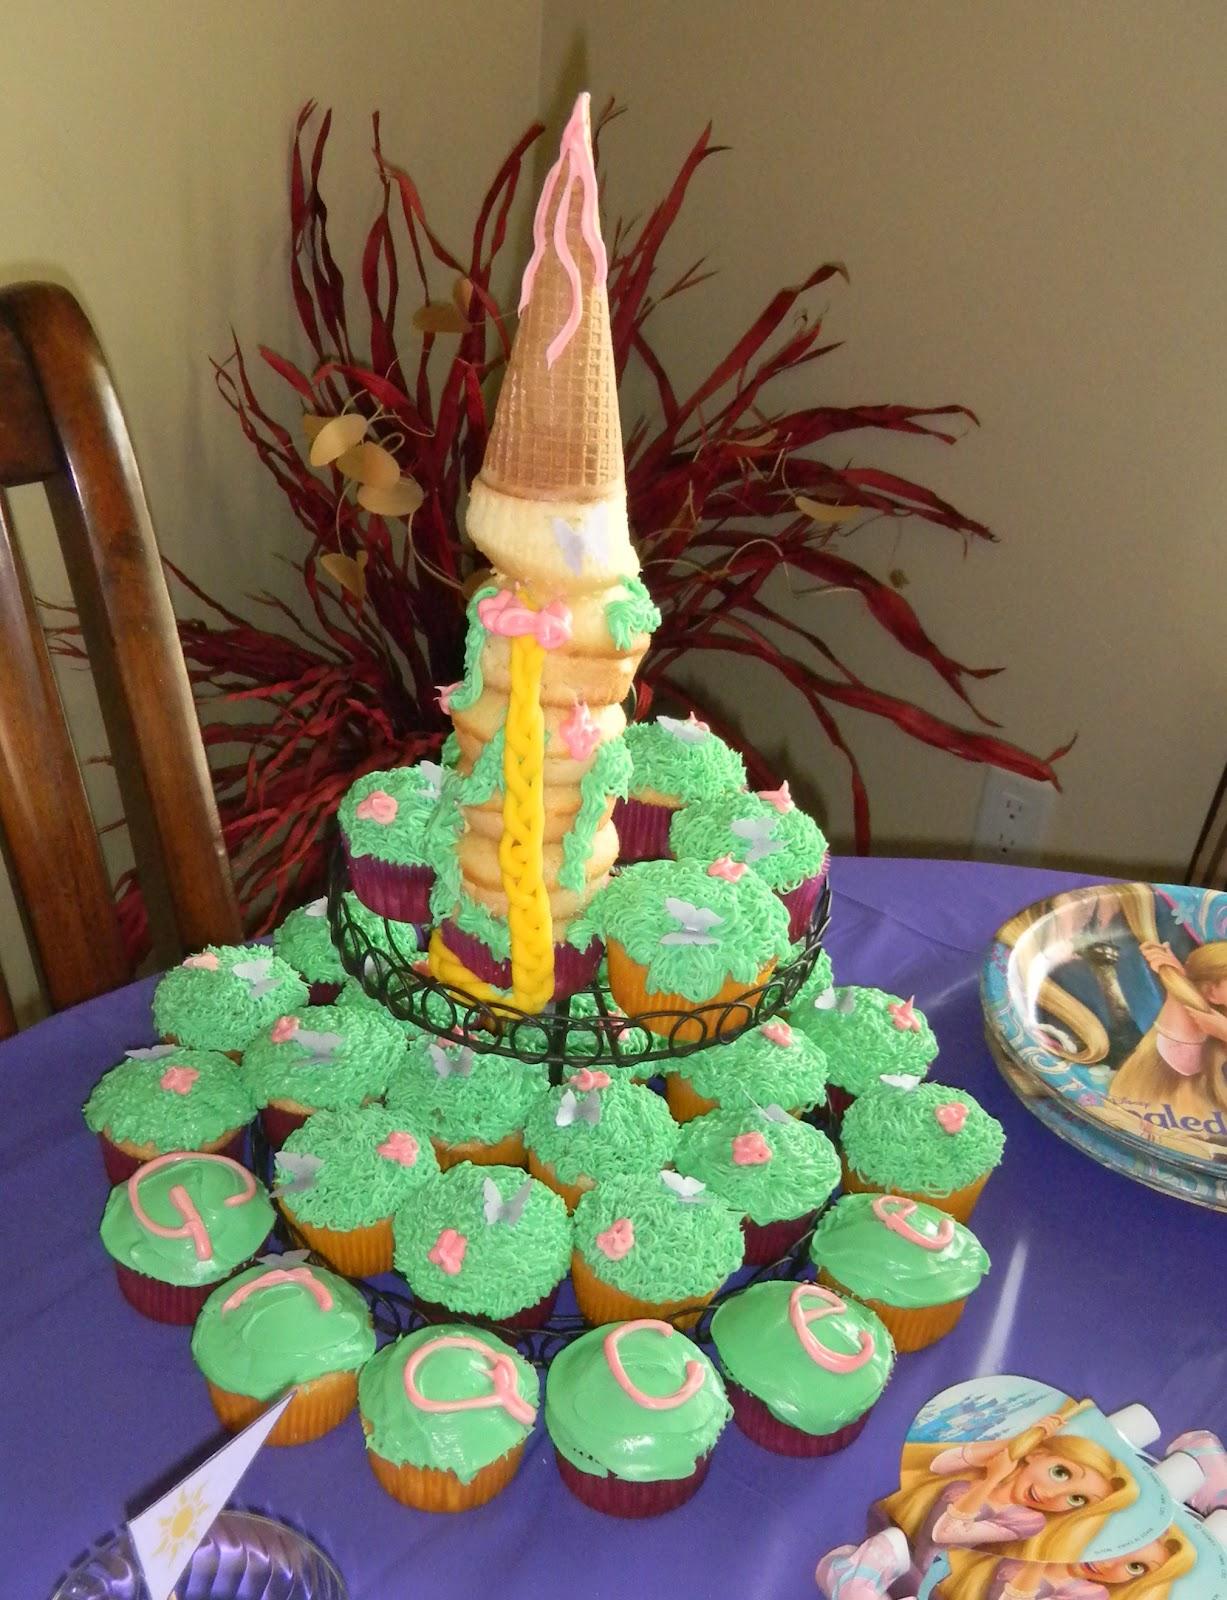 Girly Momma Designs Tangled Princess Birthday Party Food Decor Ideas